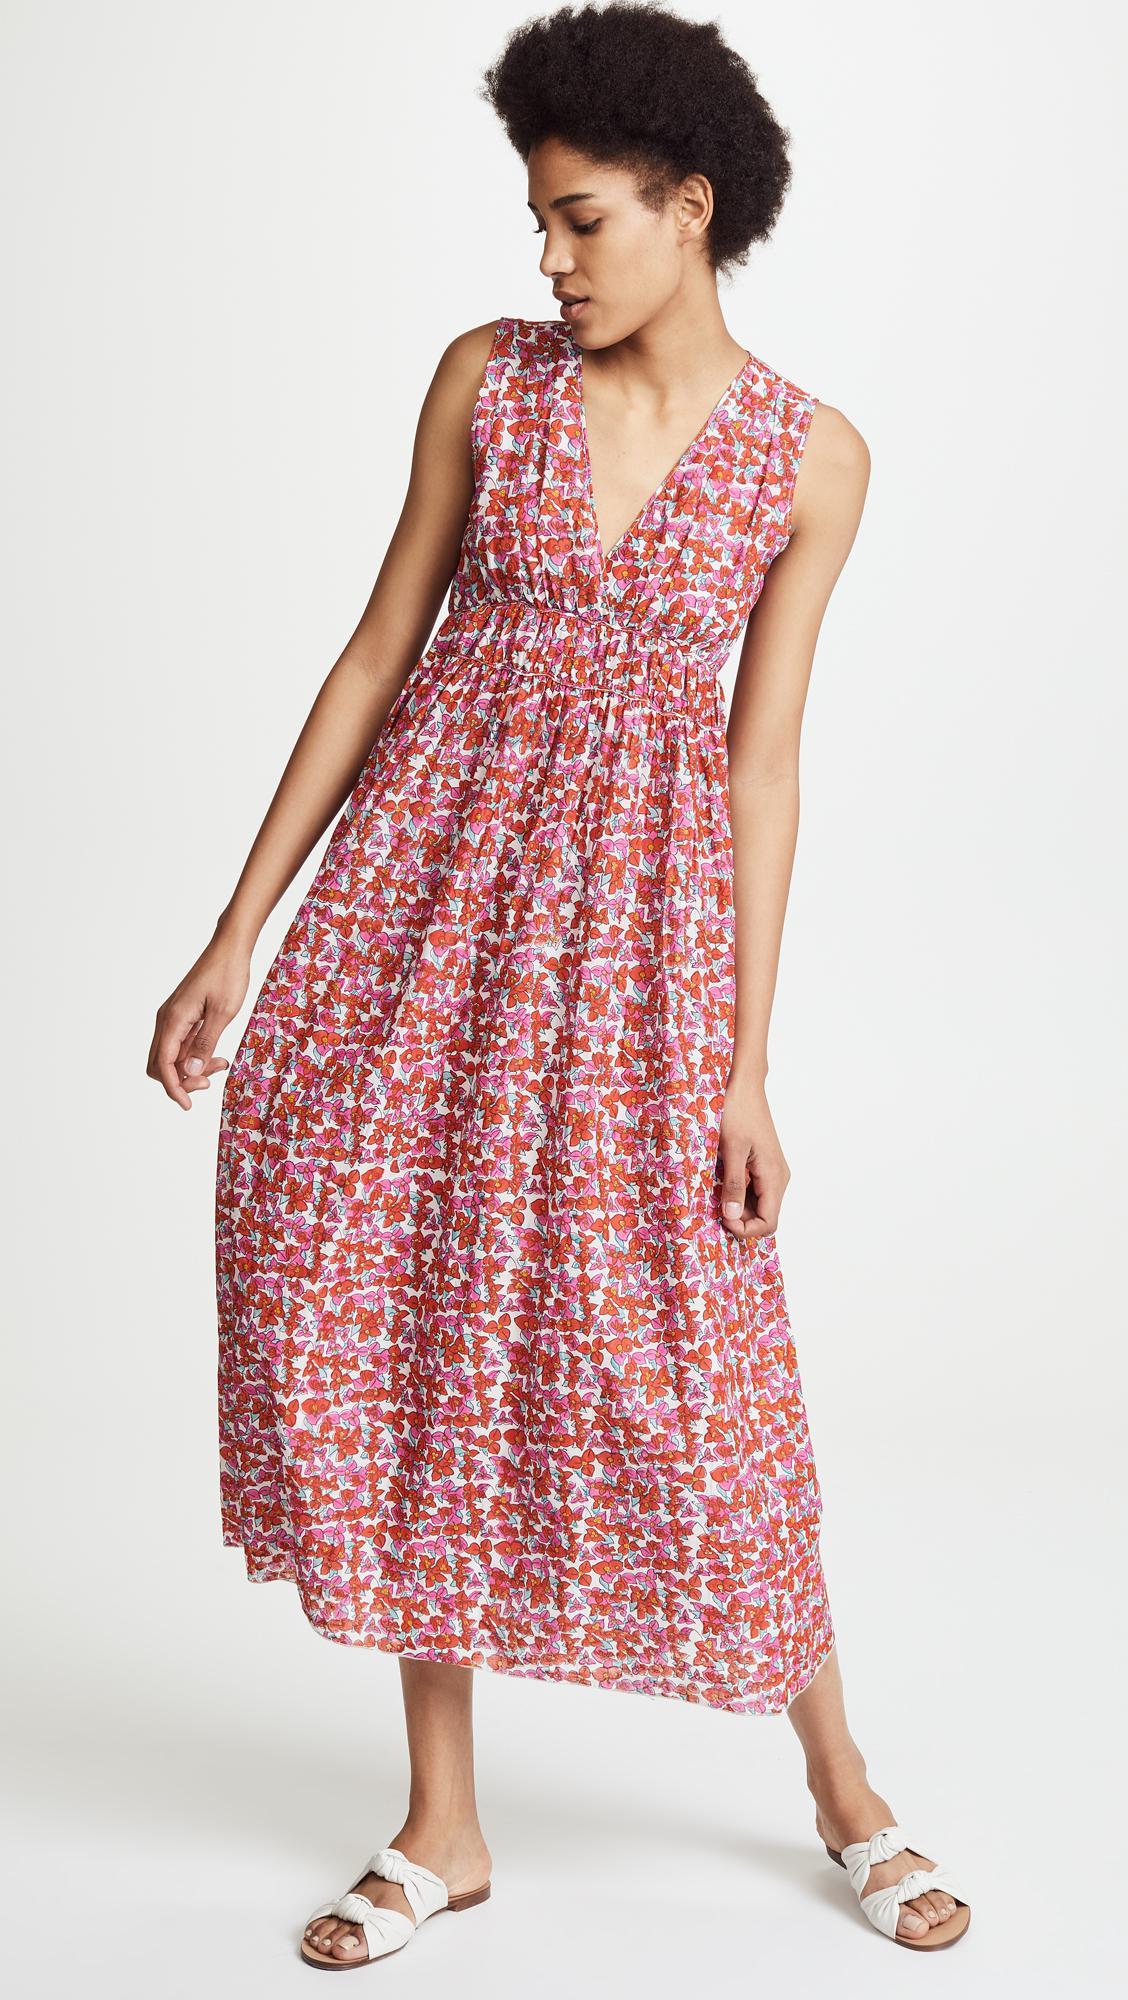 43287252b Lyst - Roberta Roller Rabbit Joana Lune Dress in Pink